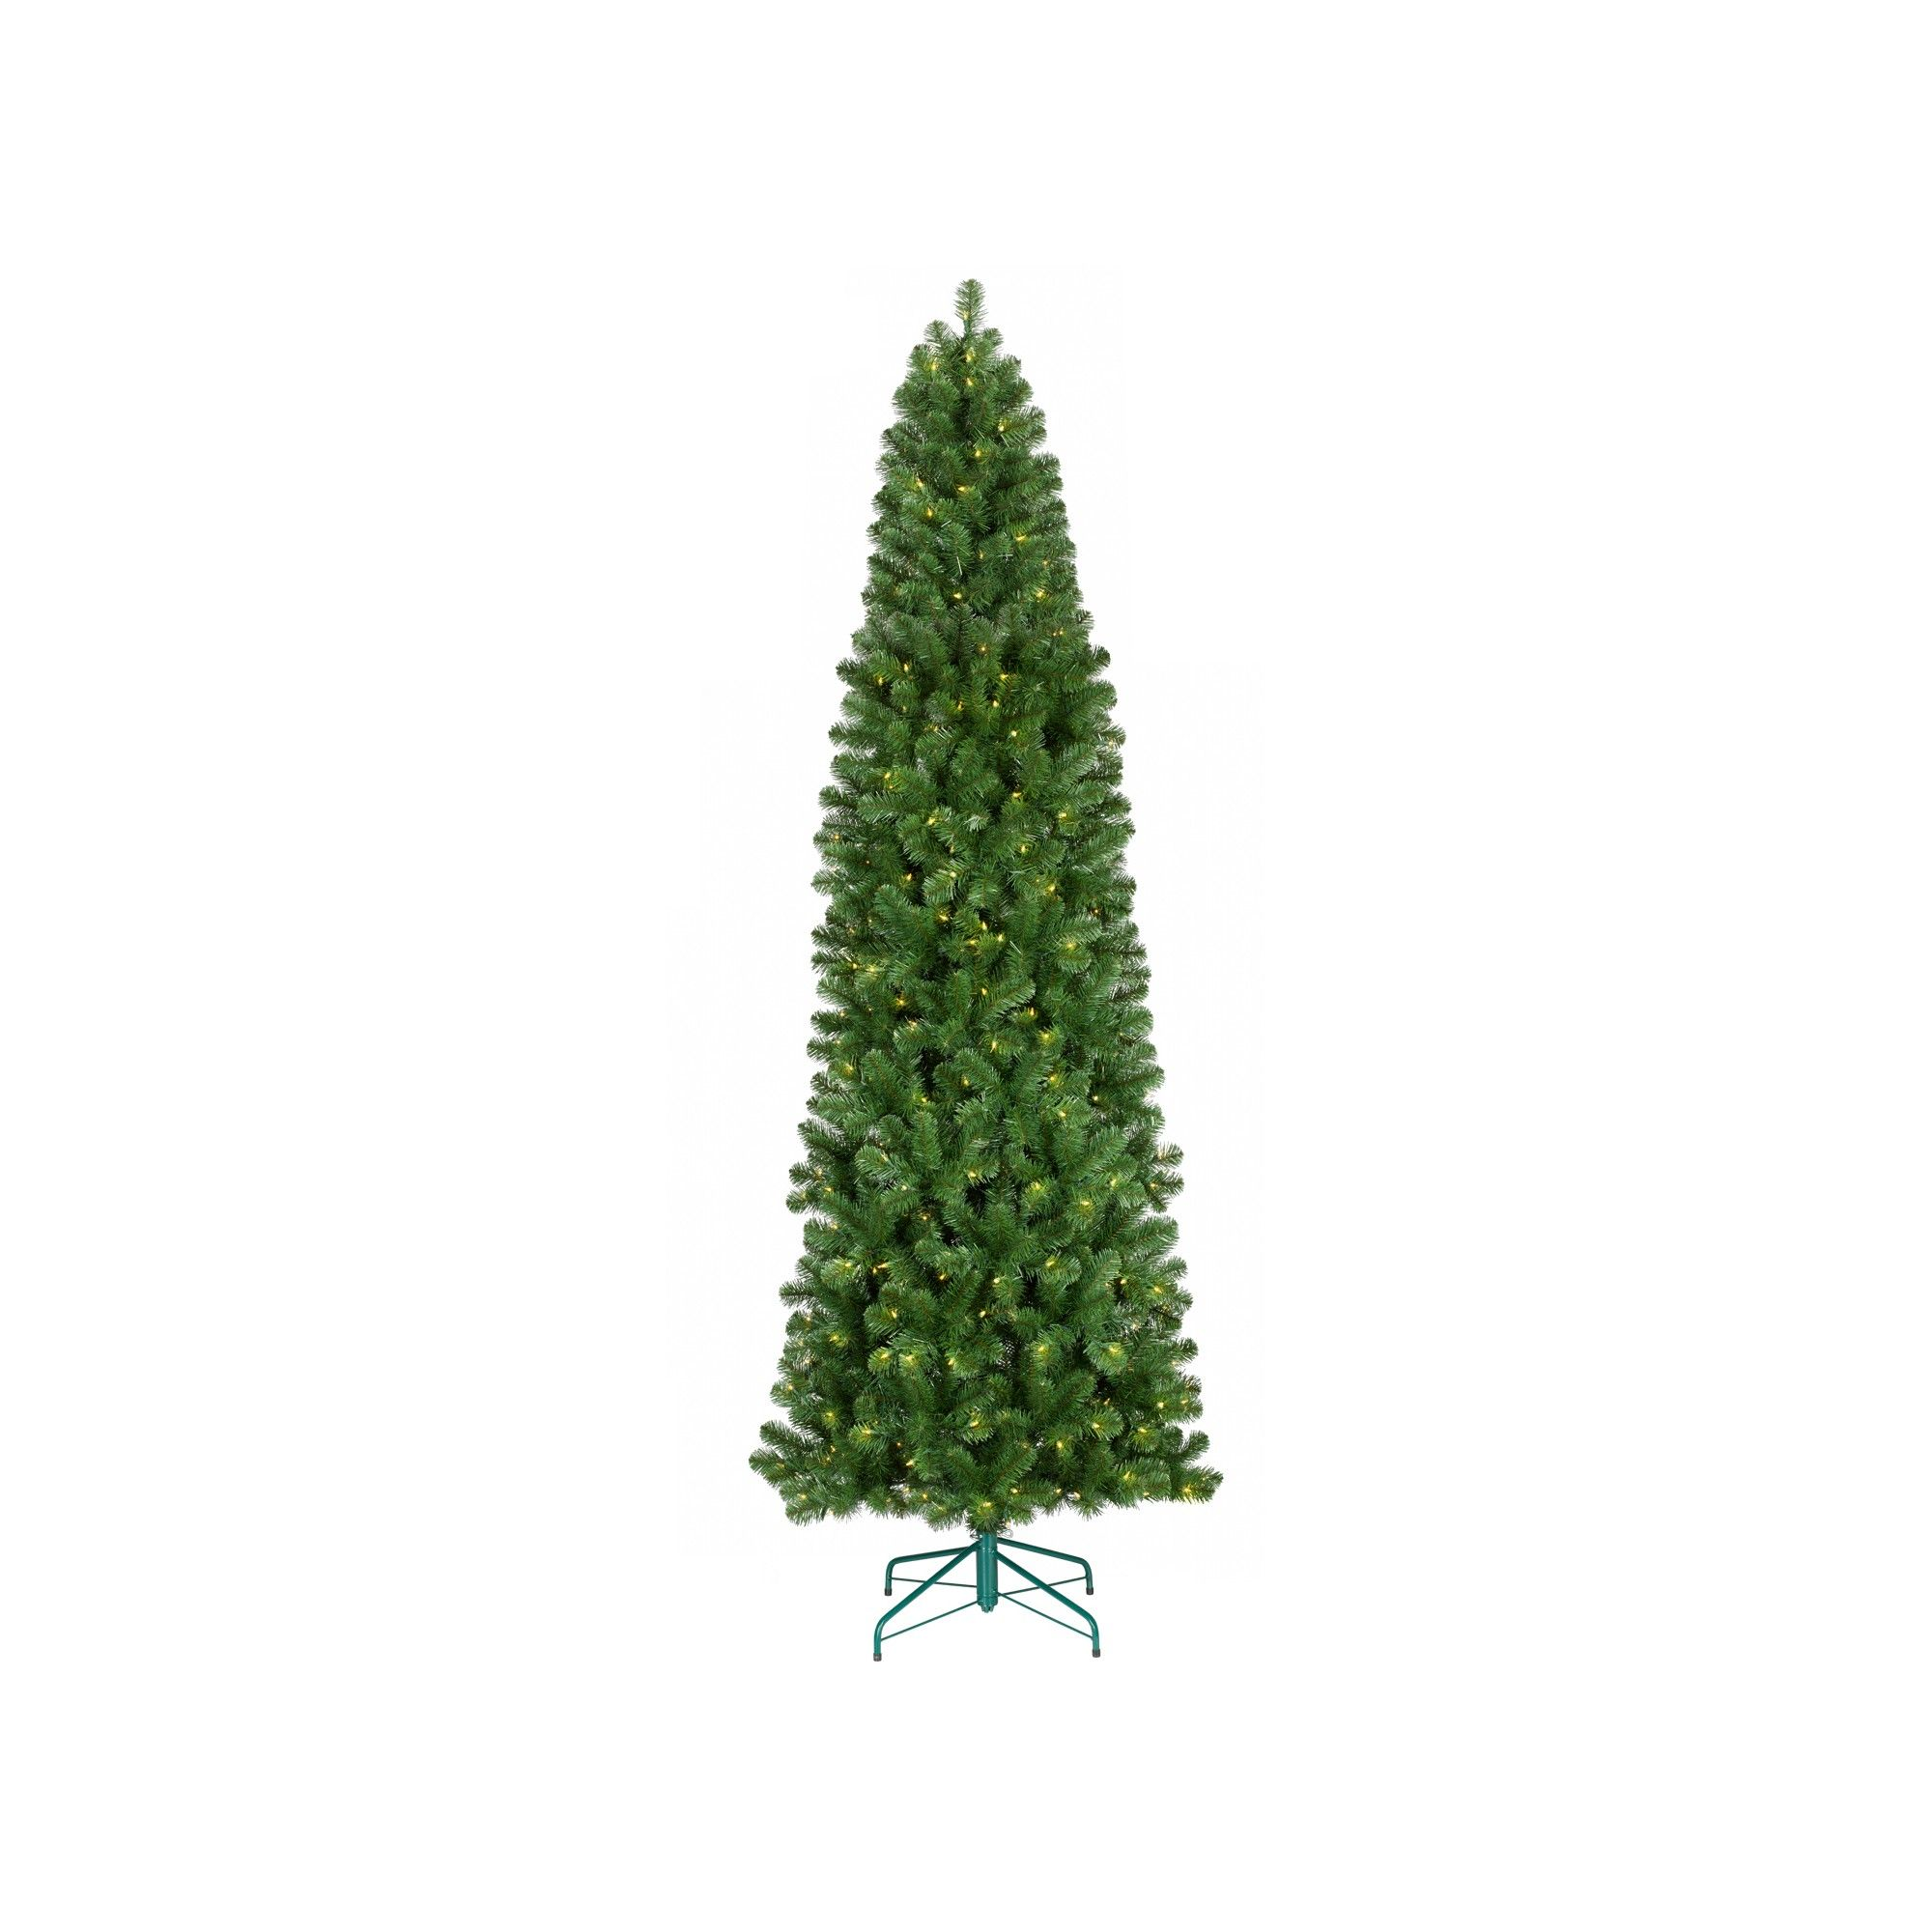 9ft prelit slim artificial christmas tree alberta spruce clear lights wondershop green - Target Christmas Tree Lights